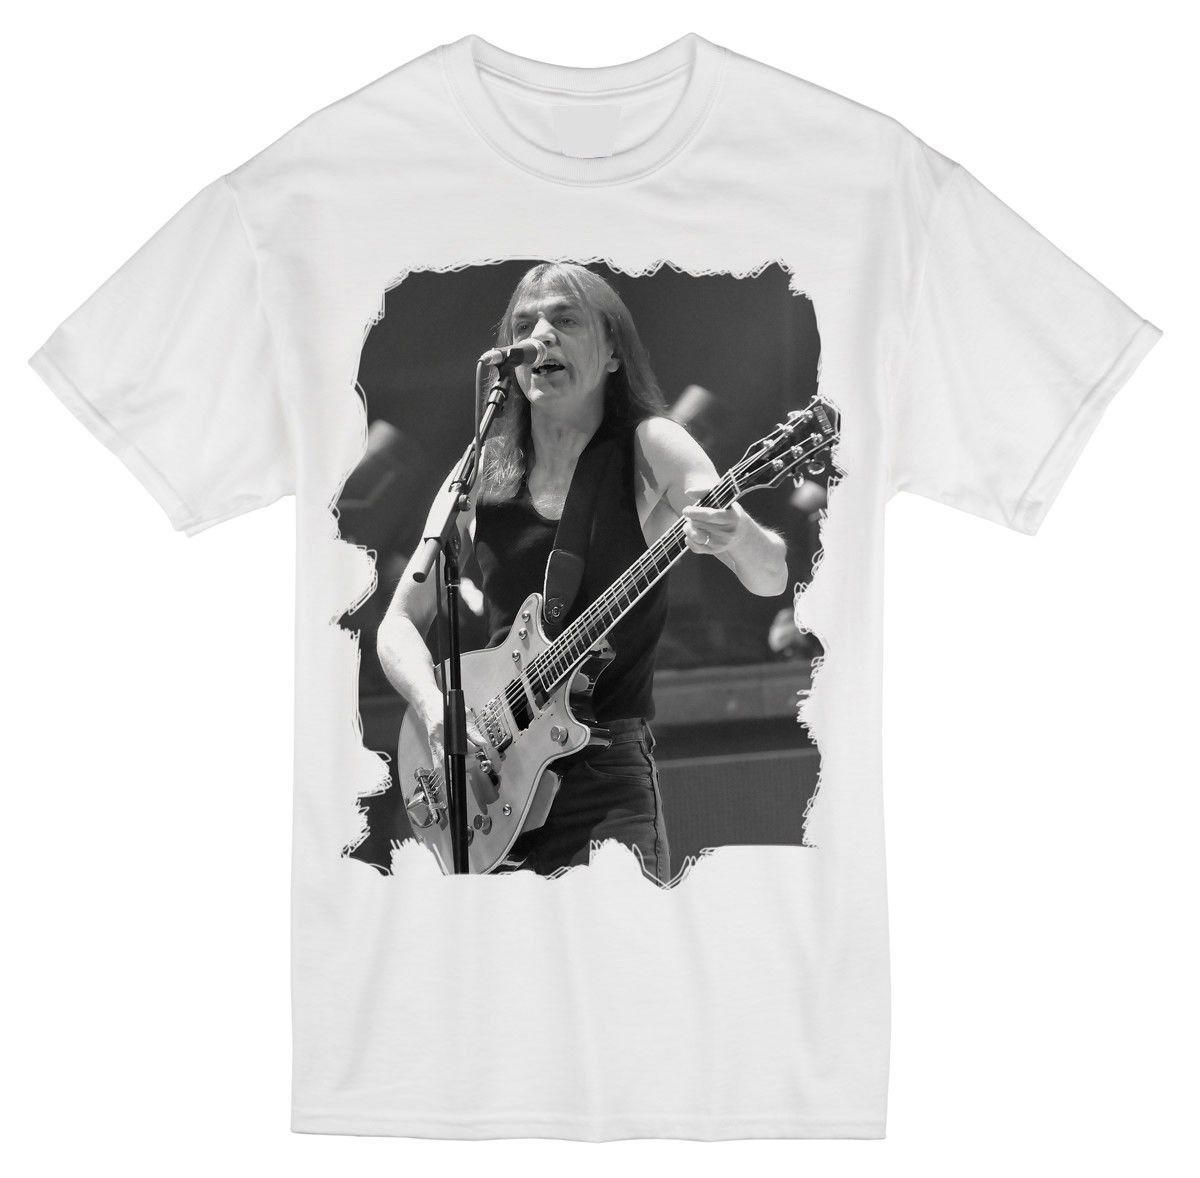 Música Masculina AC DC AC / DC T-Shirt Malcolm Young Tribute M234